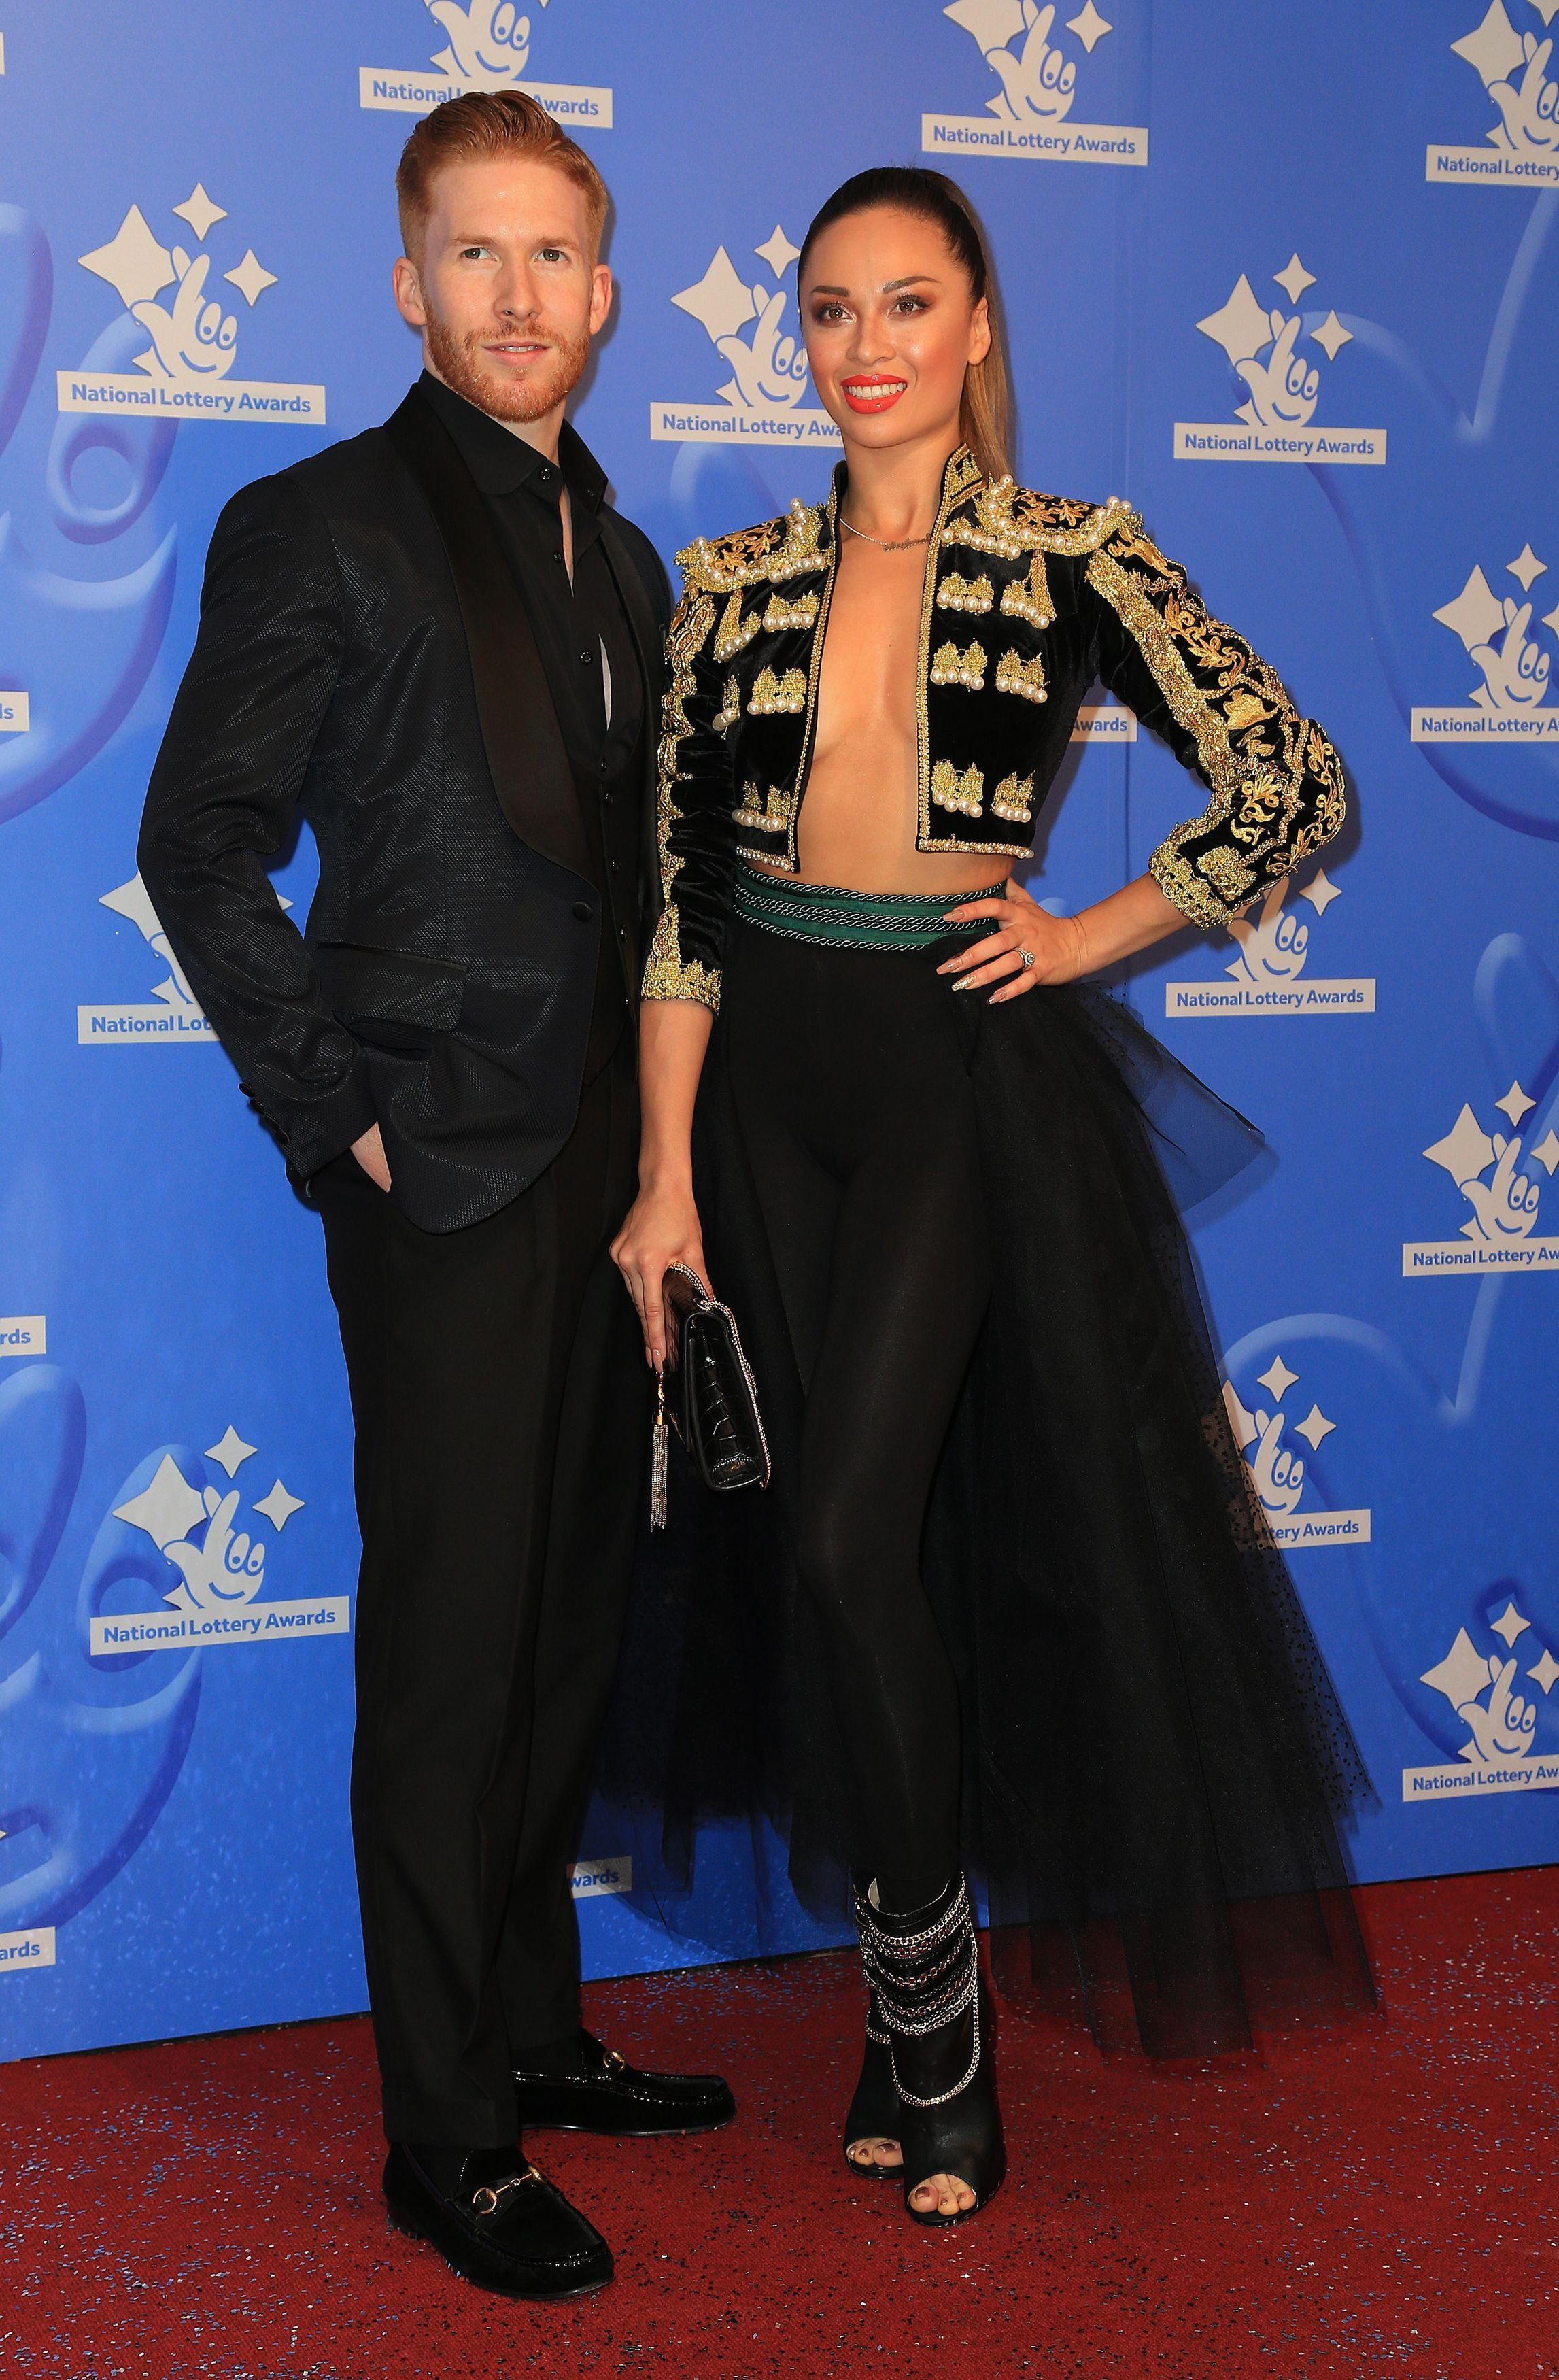 Neil and Katya Jones have split after 11 years